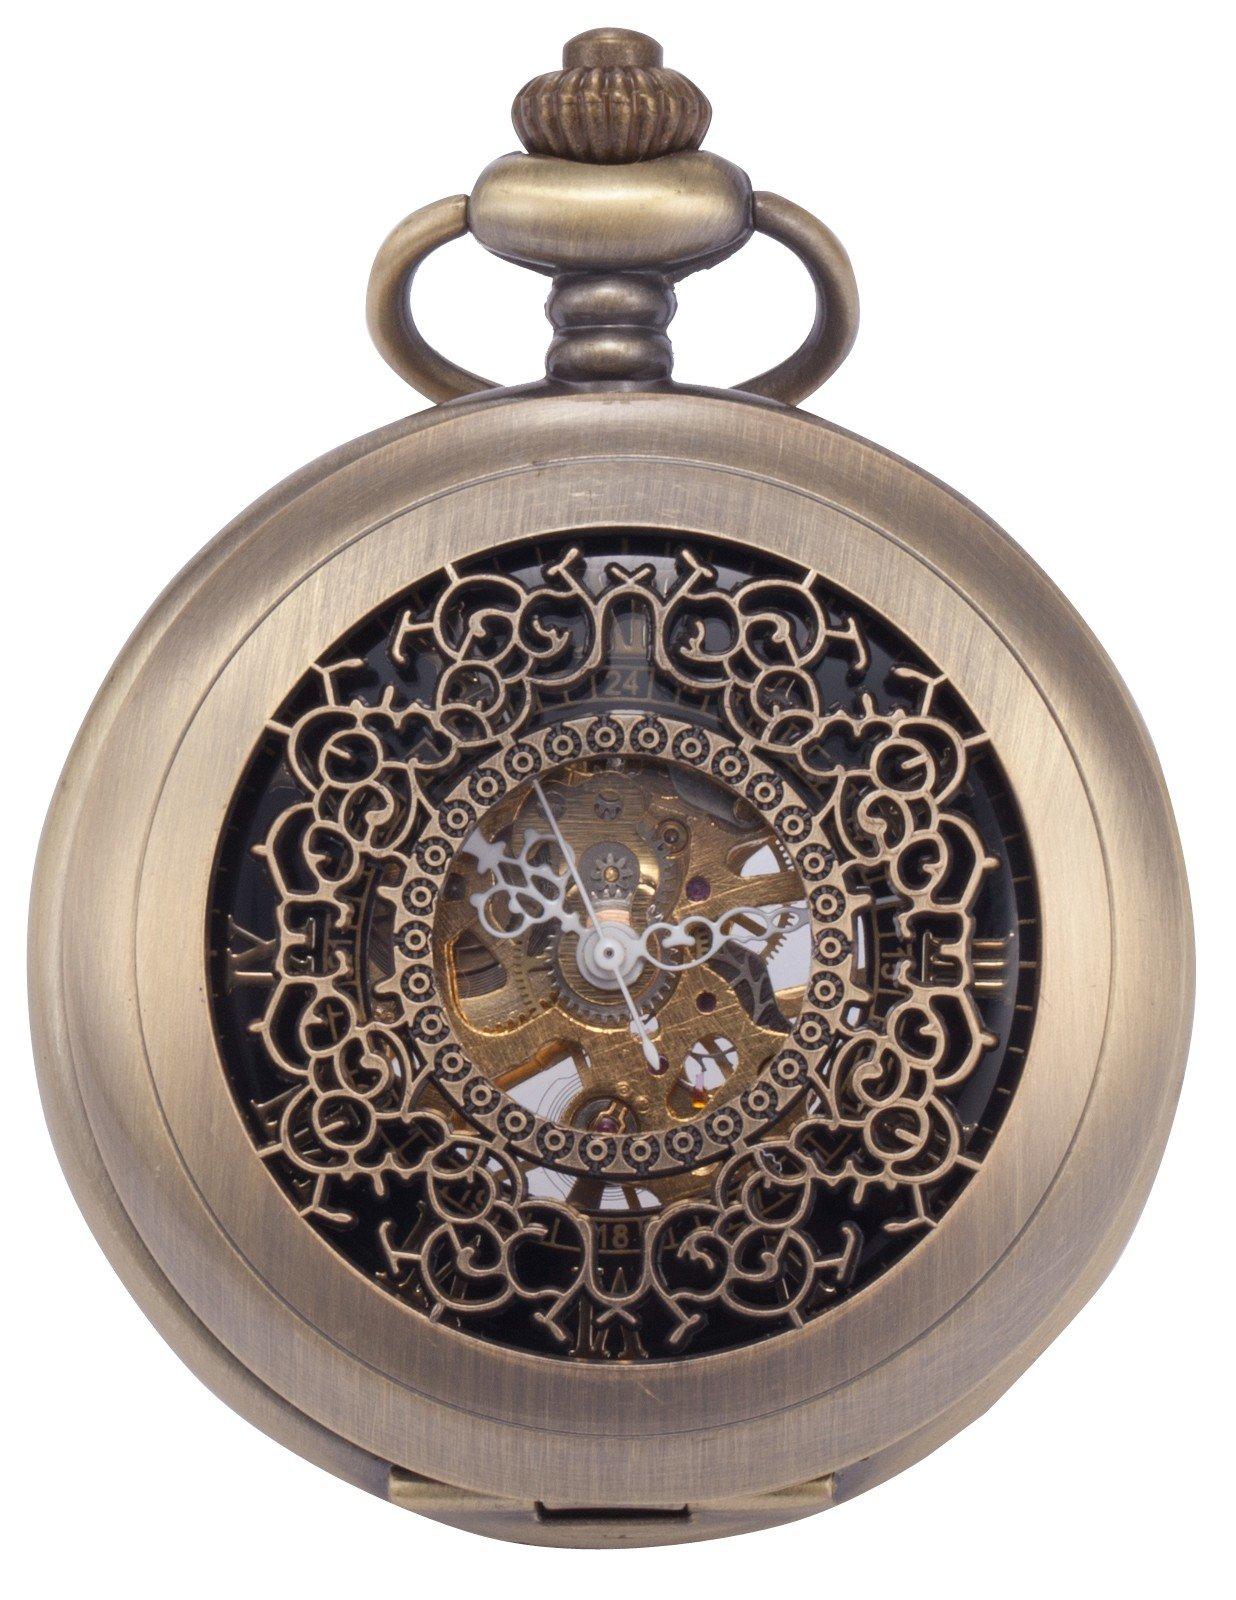 AMPM24 Vintage Men's Mechanical Pocket Watch Brass Tone + Chain WK914